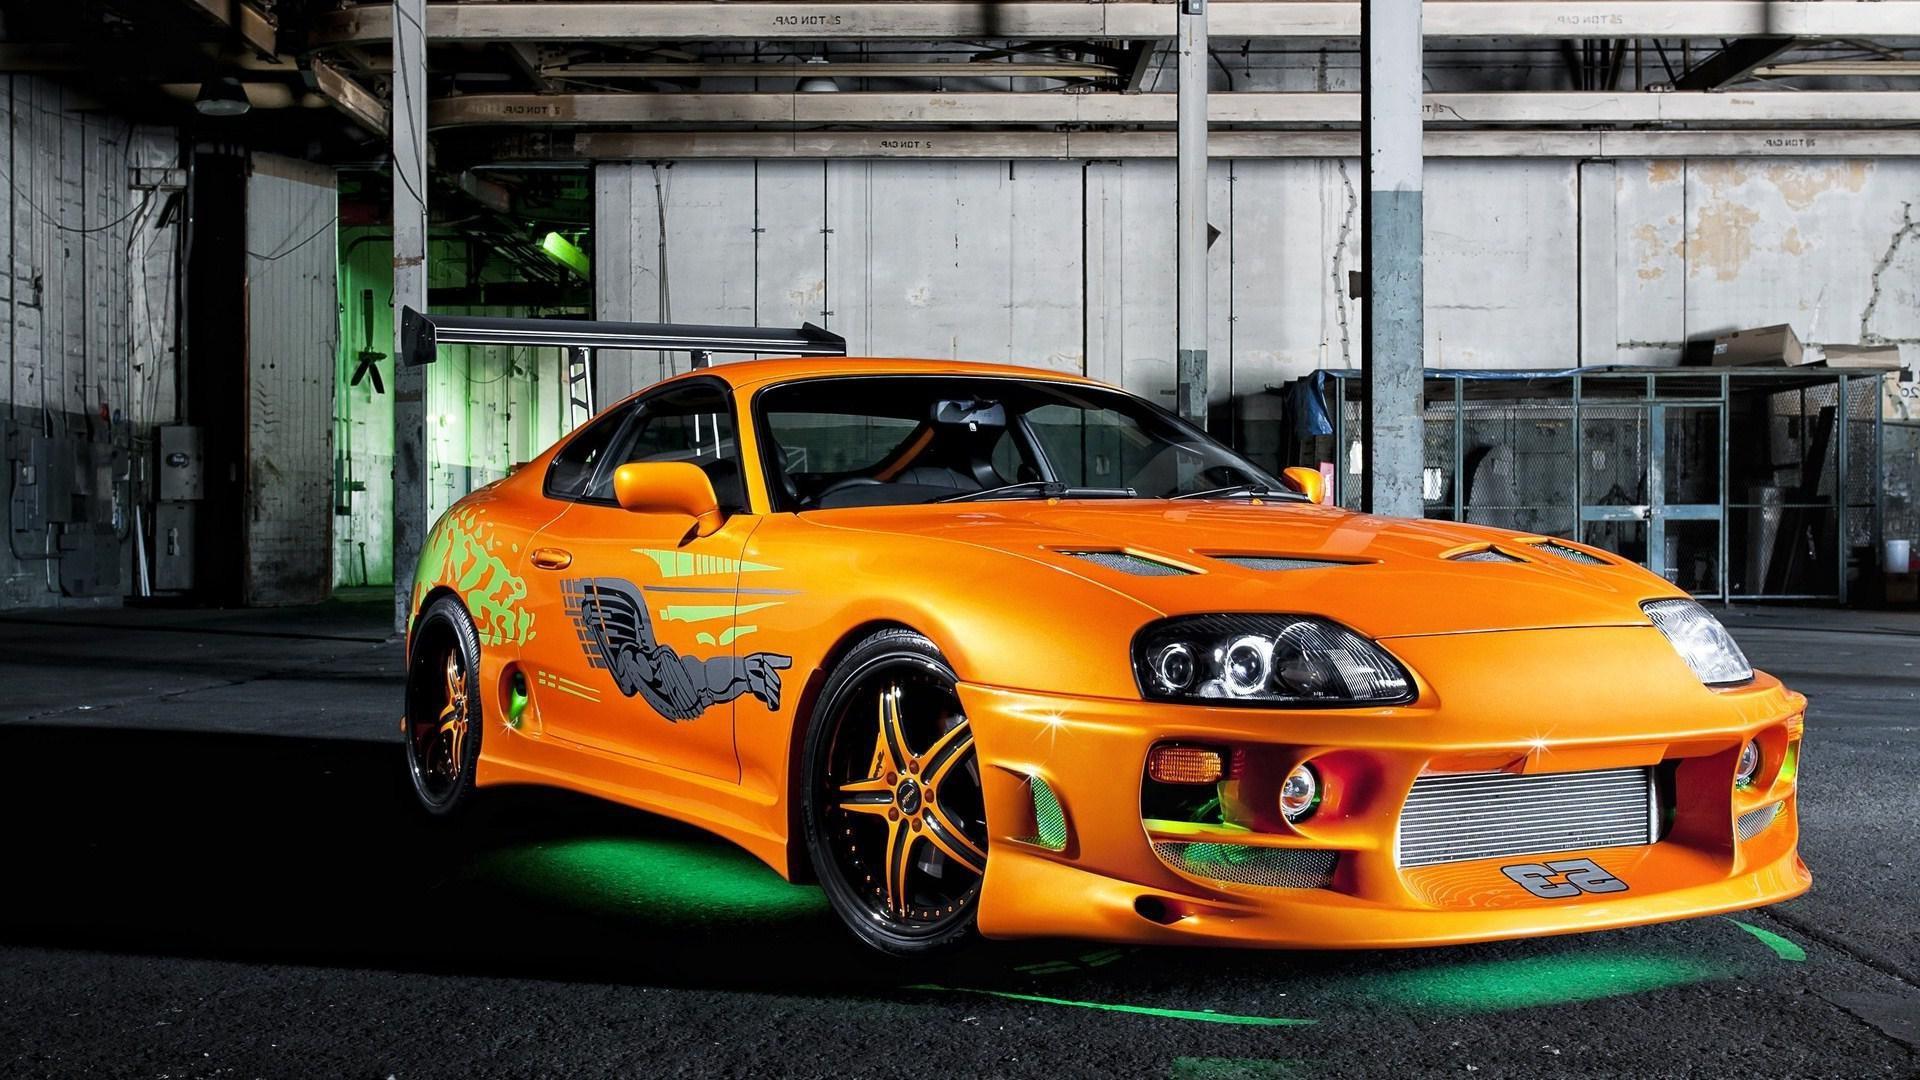 Toyota Supra Full HD